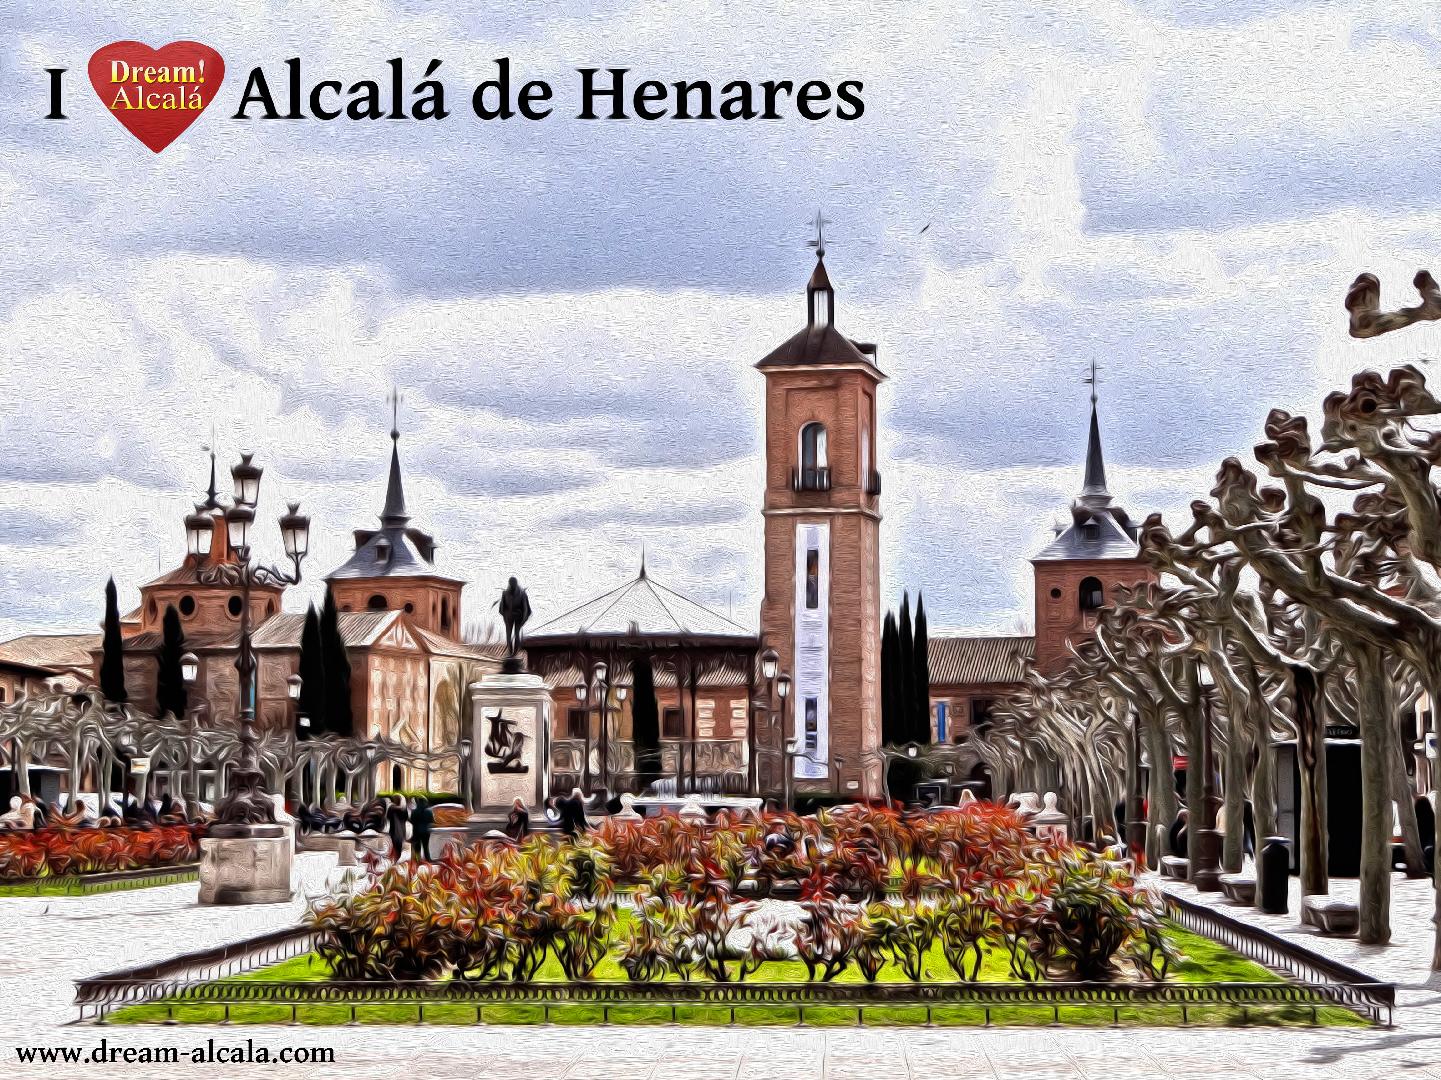 Me gusta alcal de henares dream alcal - Casas regionales alcala de henares ...